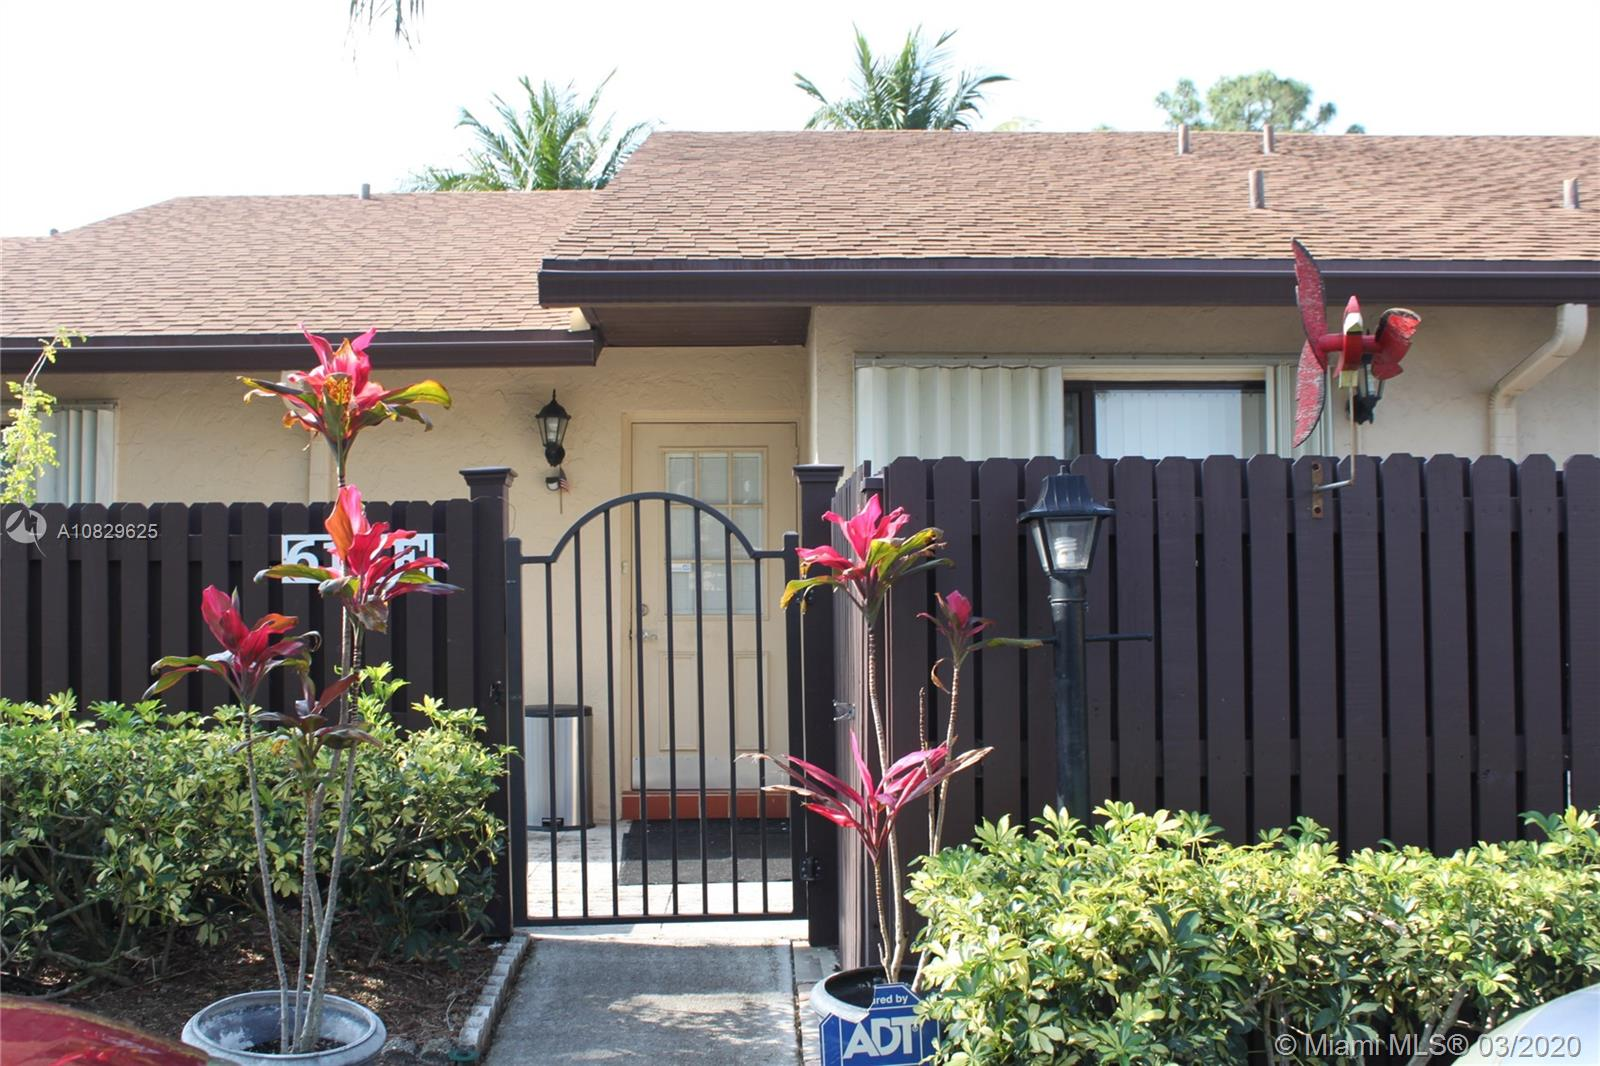 613 Sea Pine Way E, Green Acres, FL 33415